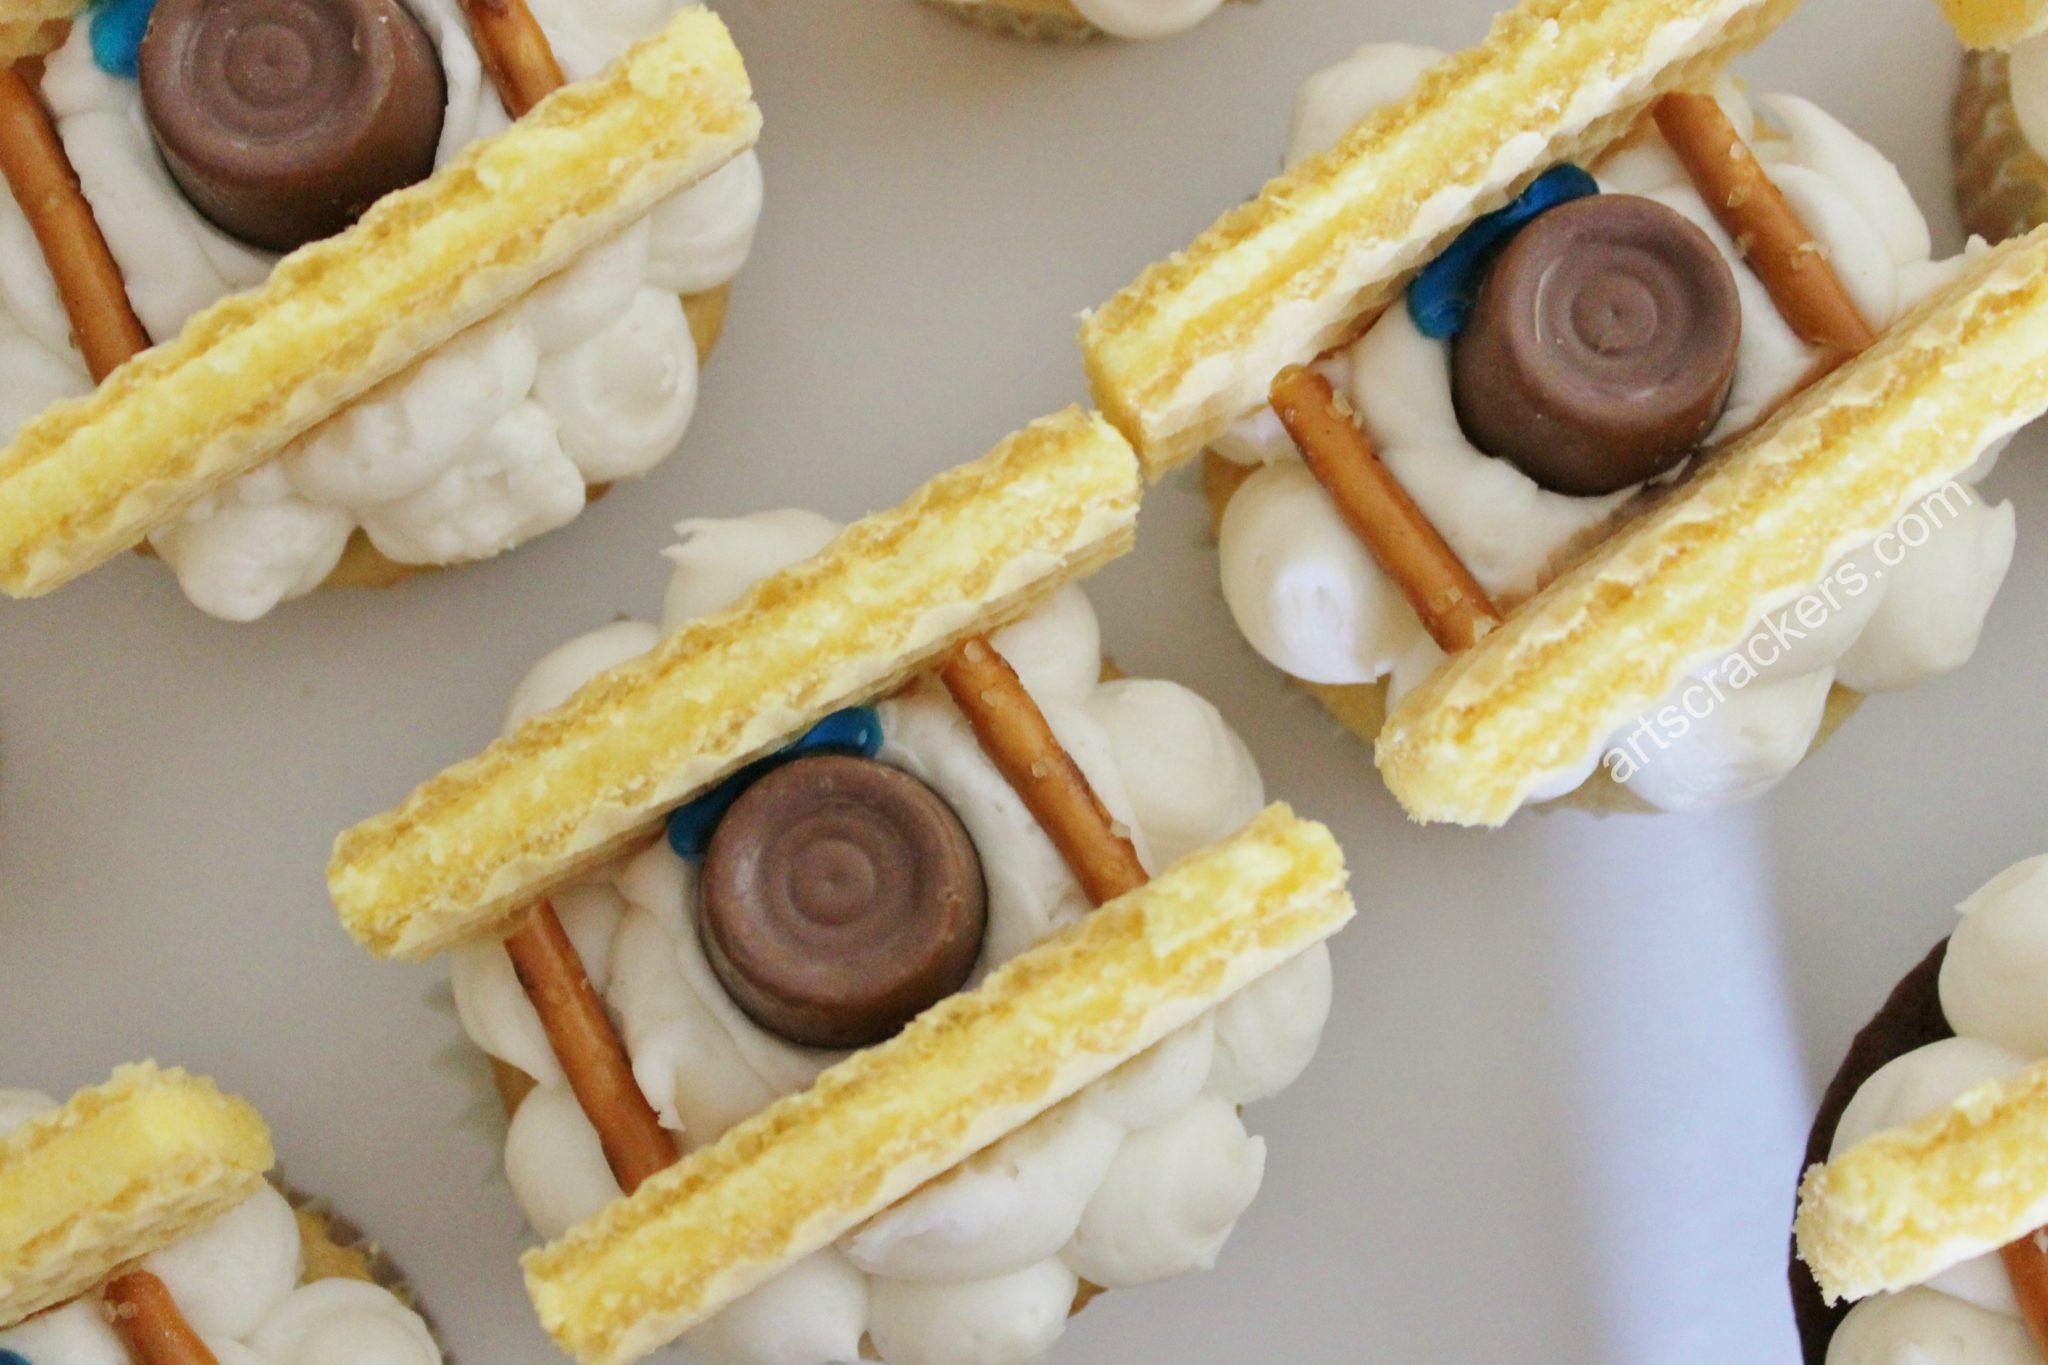 Biplane Cupcakes with Pretzel Poles